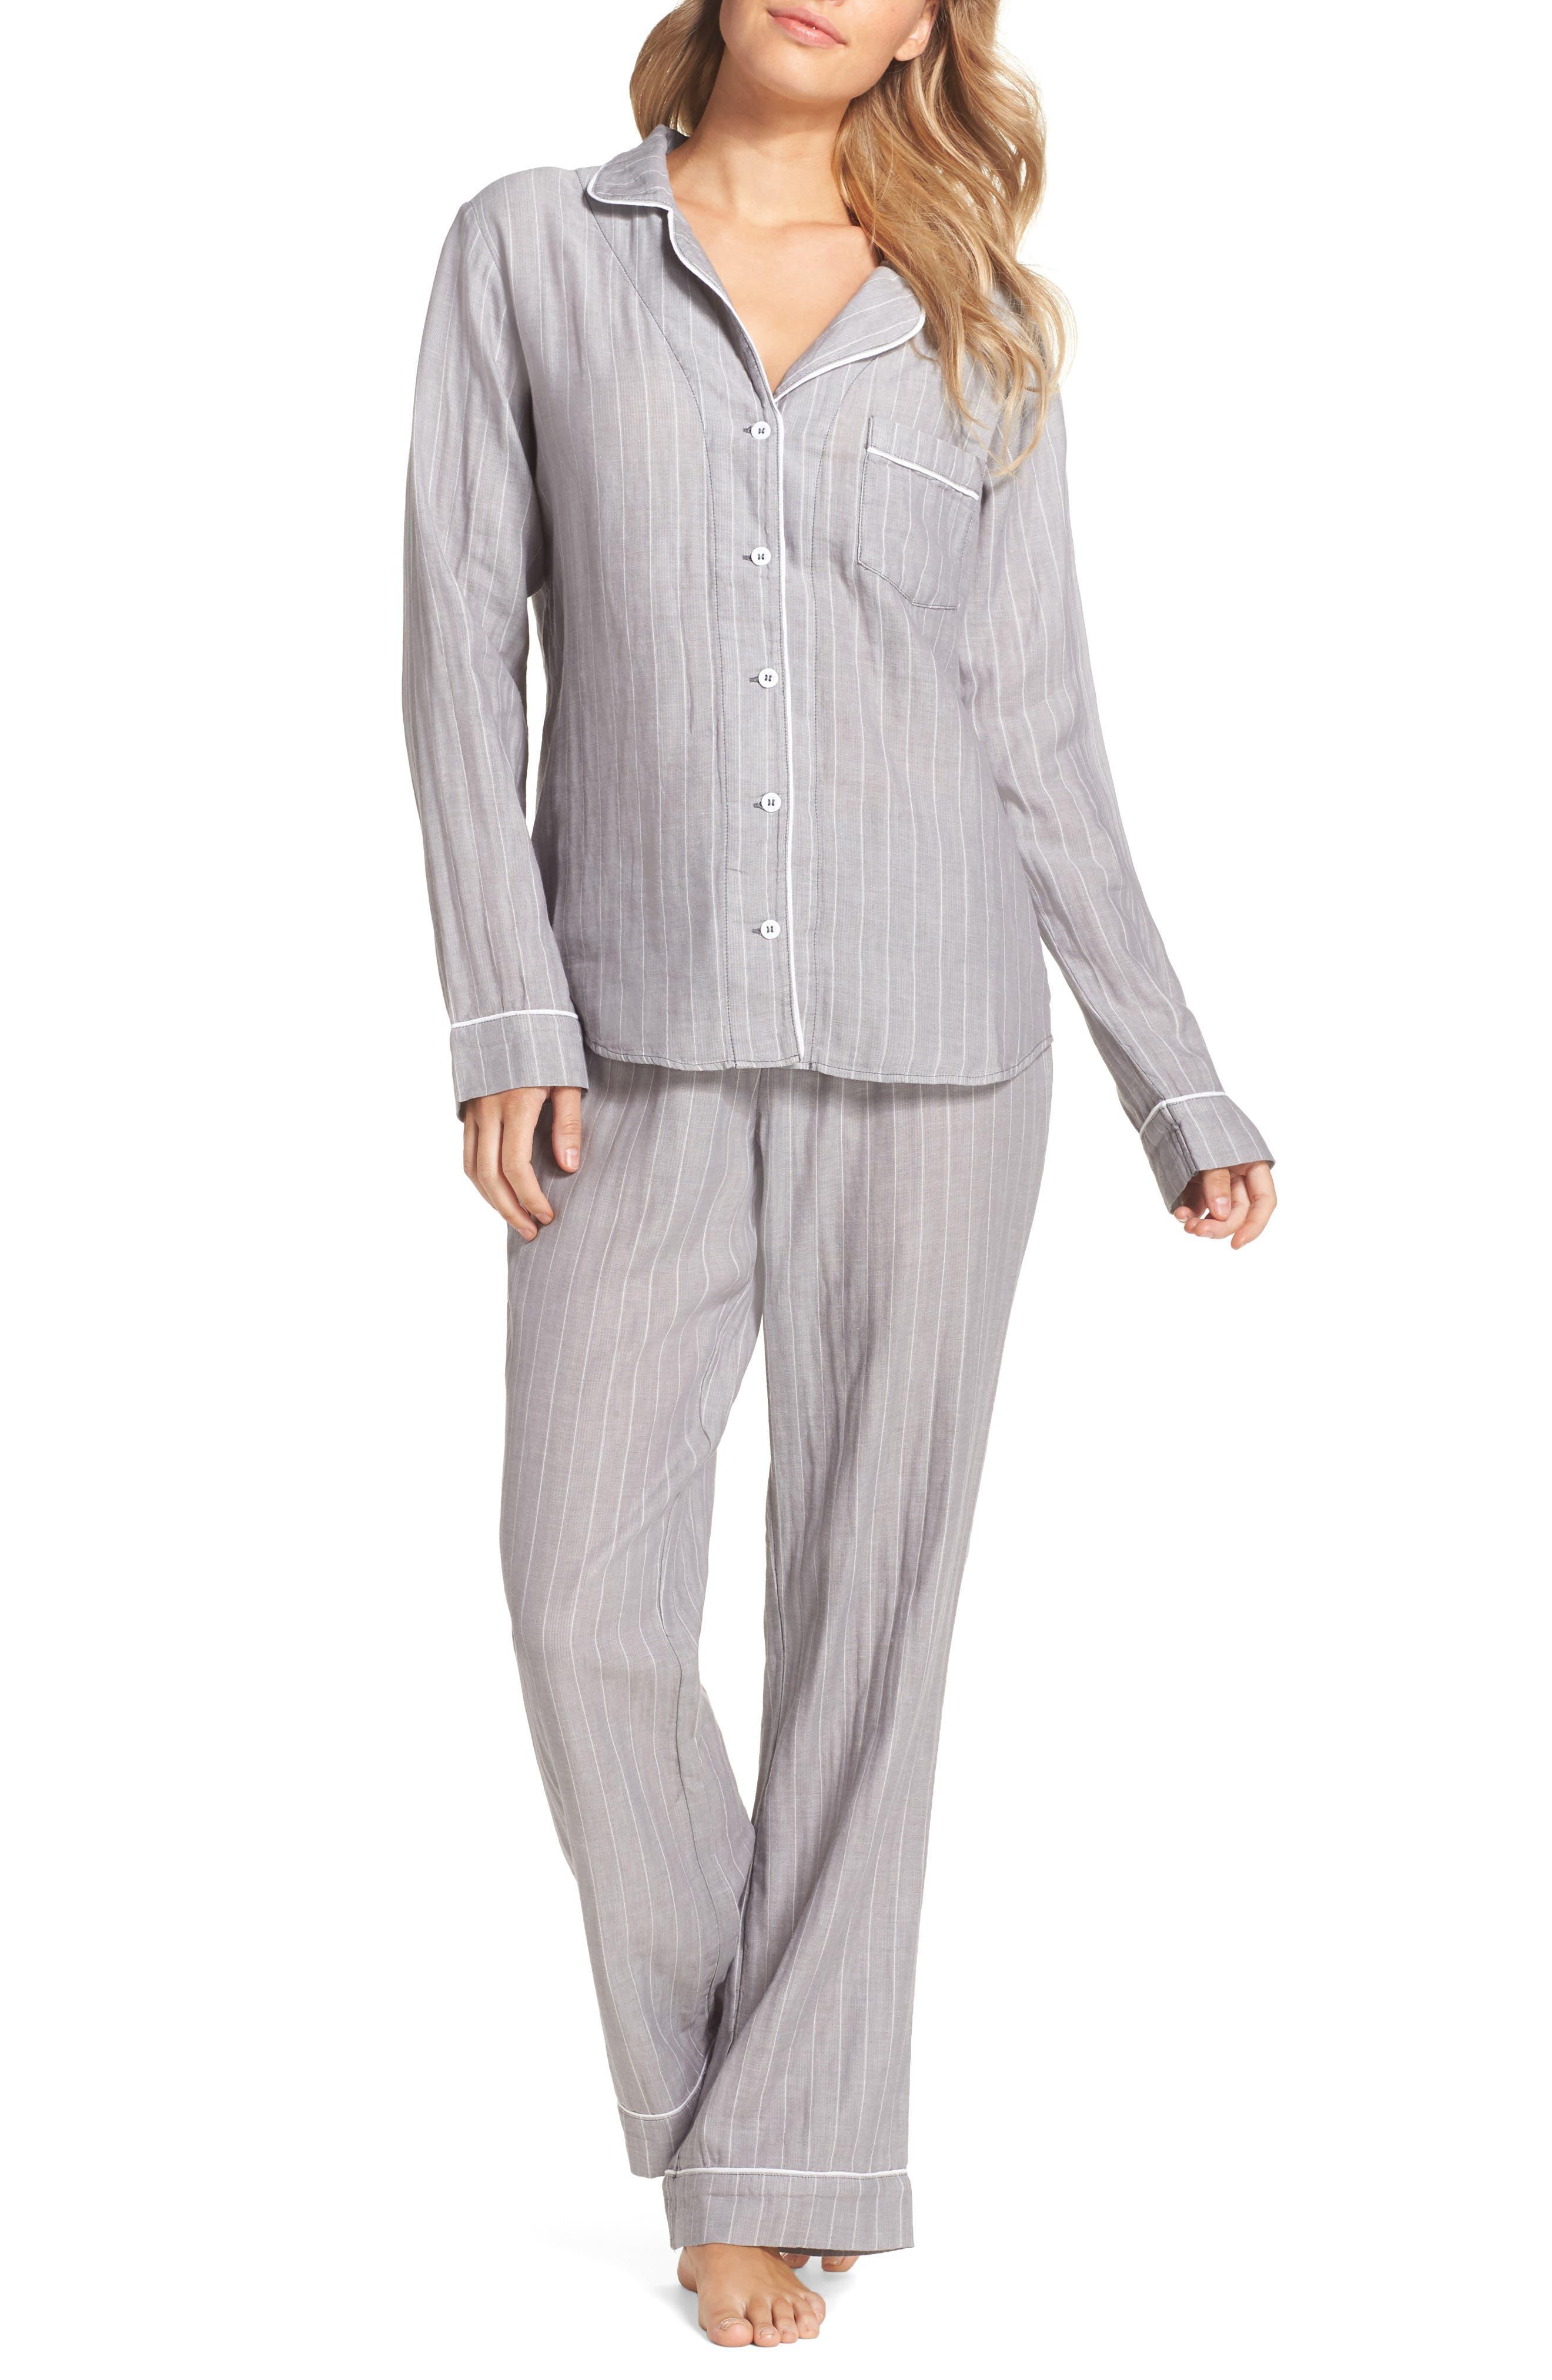 Raven Stripe Pajamas,                         Main,                         color, Seal